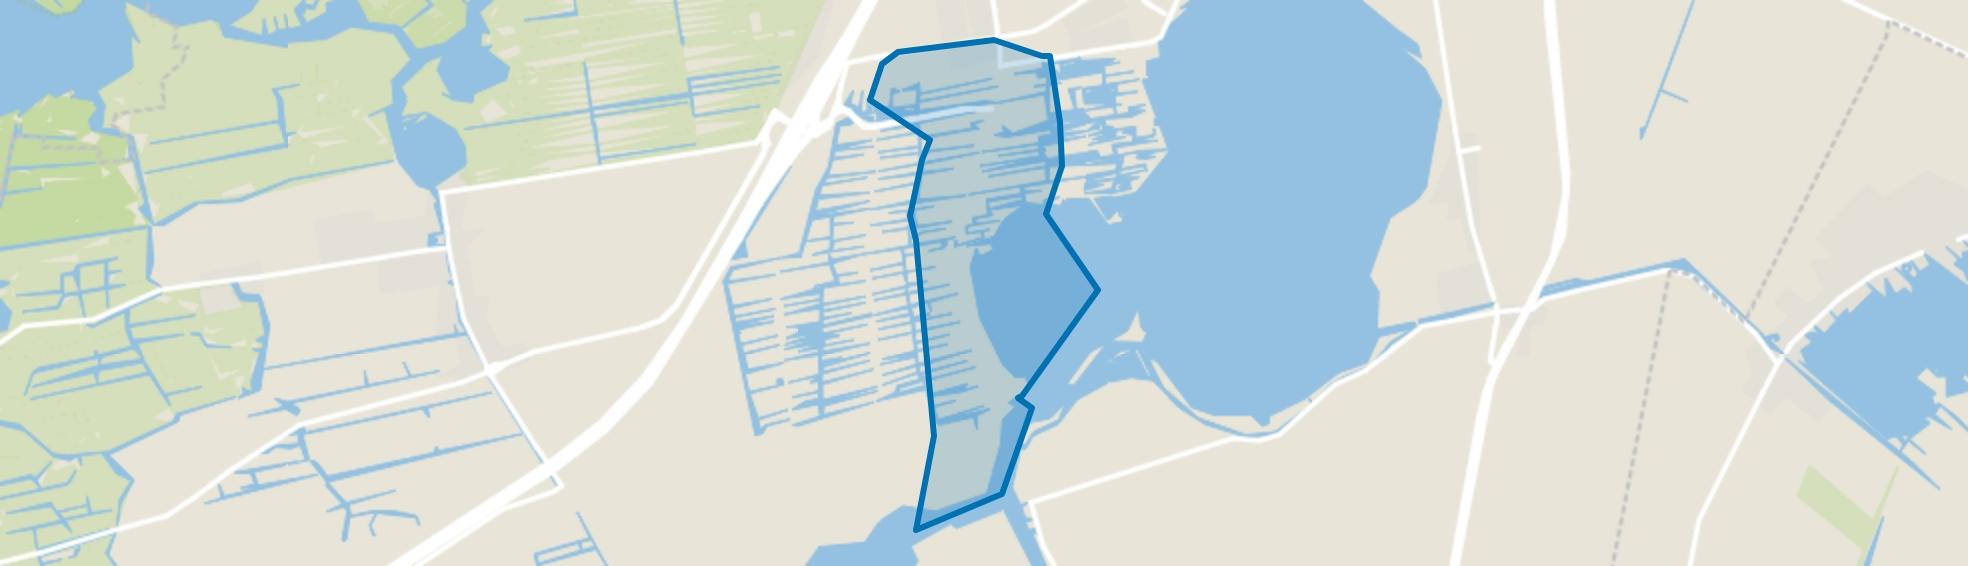 Roelofarendsveen, Roelofarendsveen map